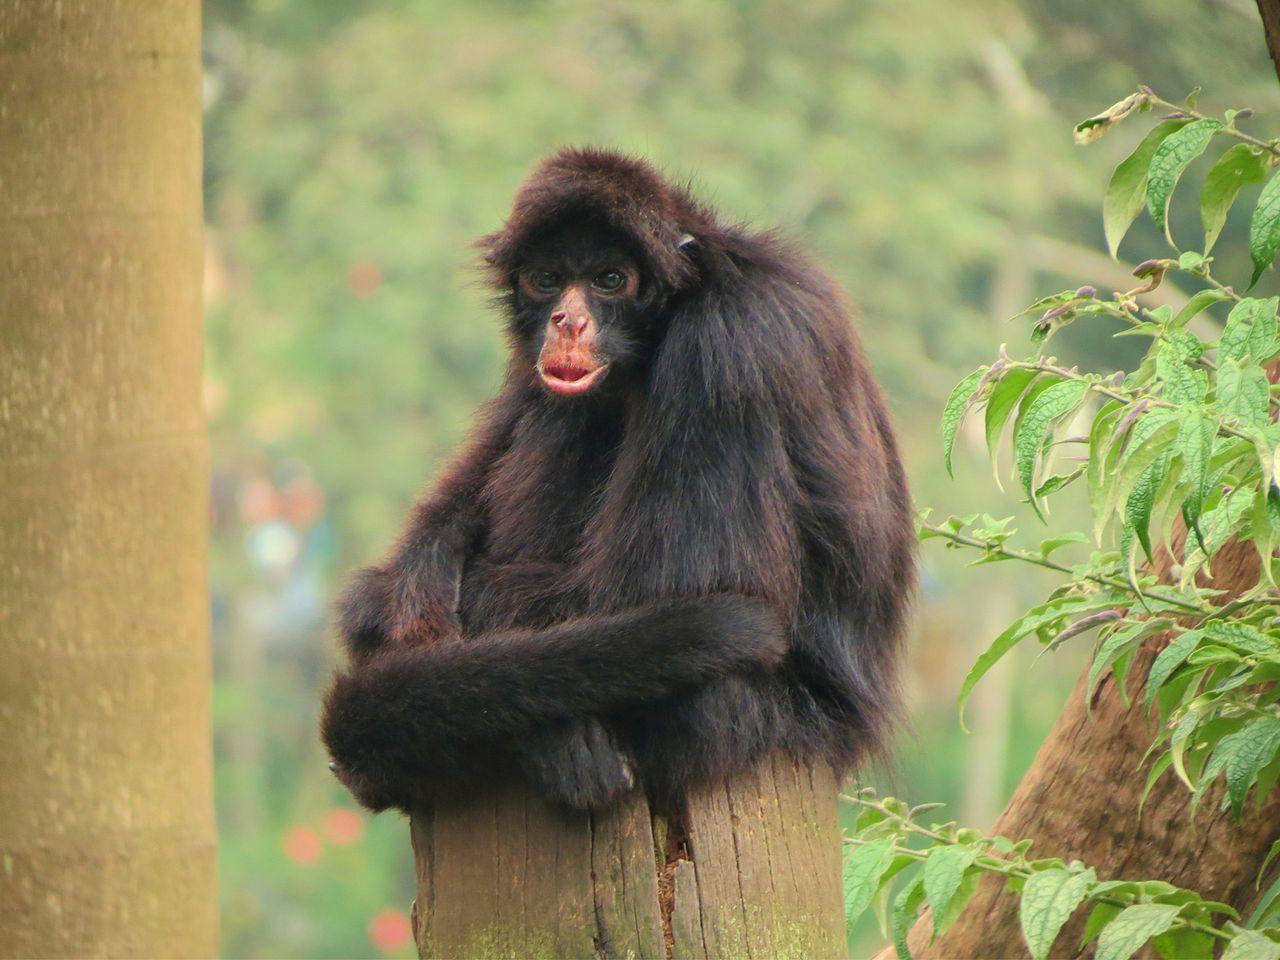 Macaco-aranha-peruano